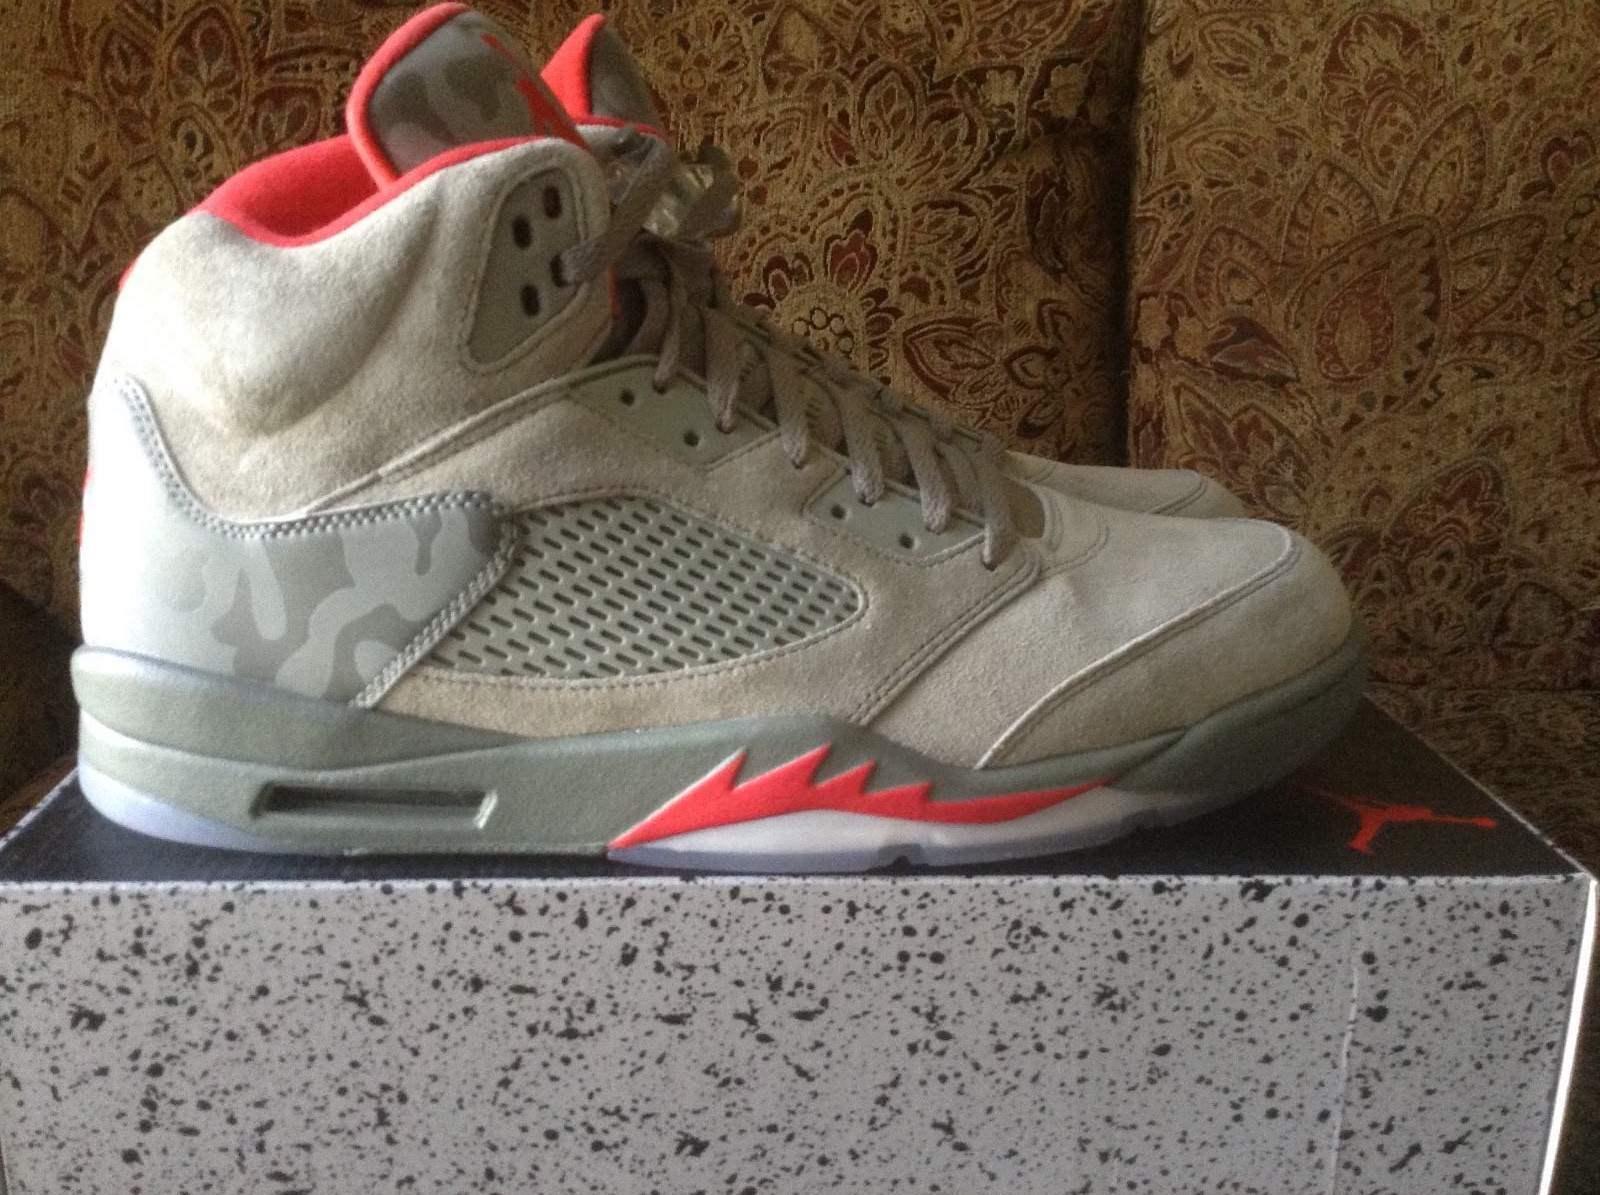 Nike air jordan 5 'buio stucco mimetico 136027-051 taglia 14